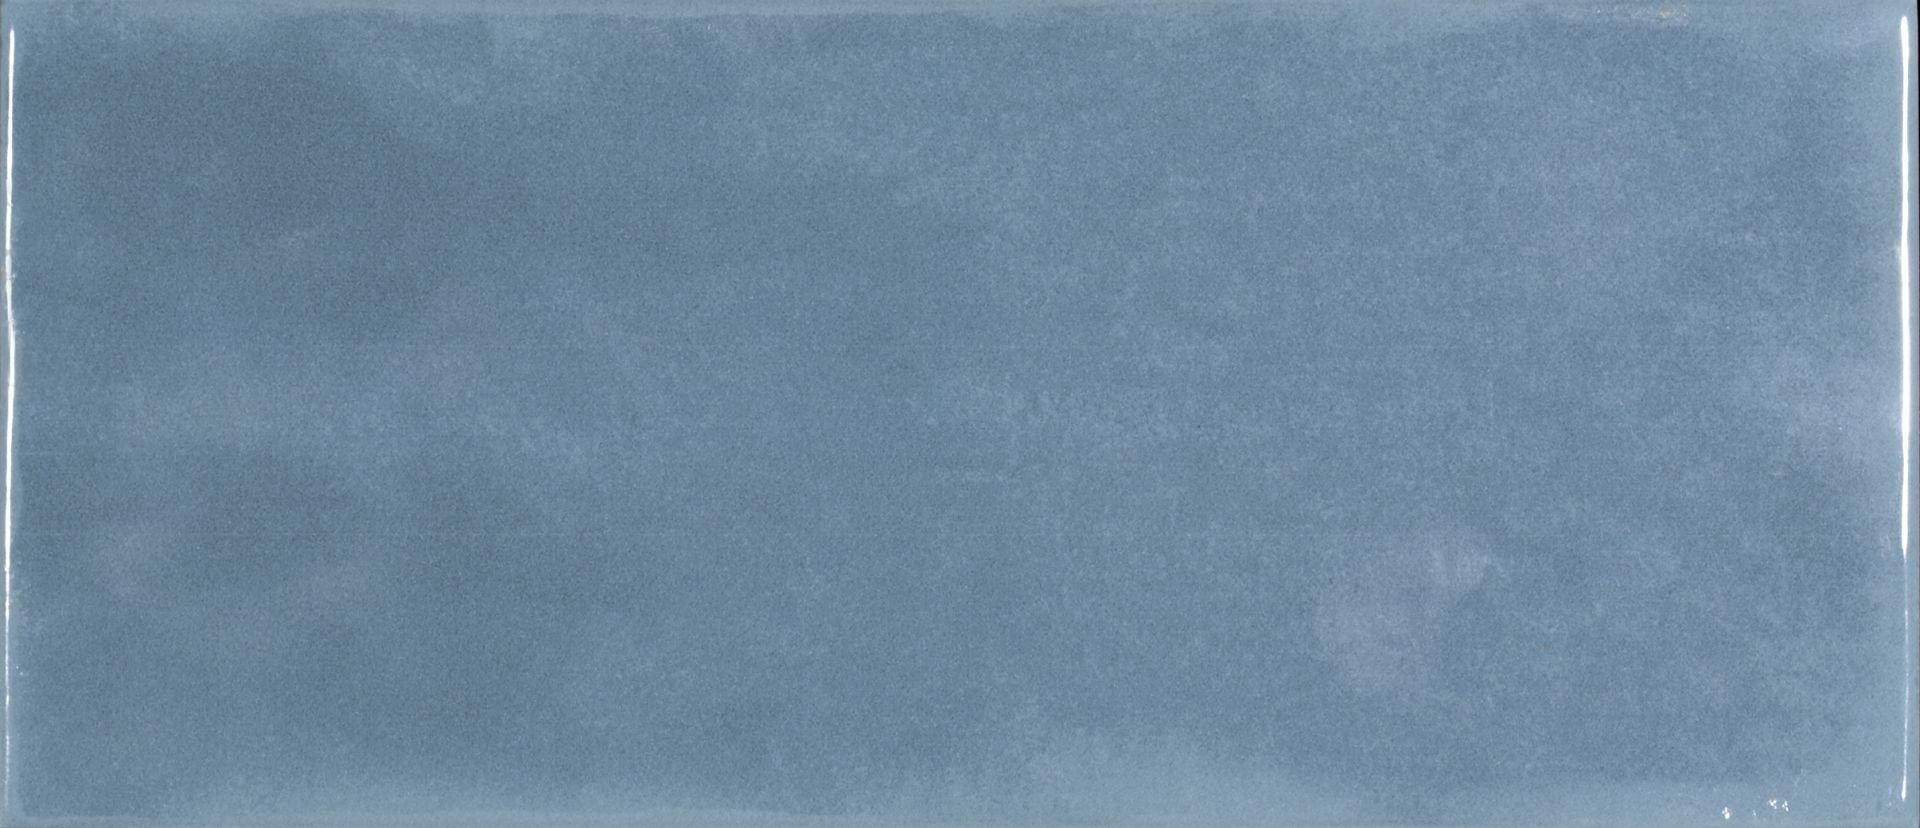 Maiolica Blue Steel - obklad 11x25 tyrkysová